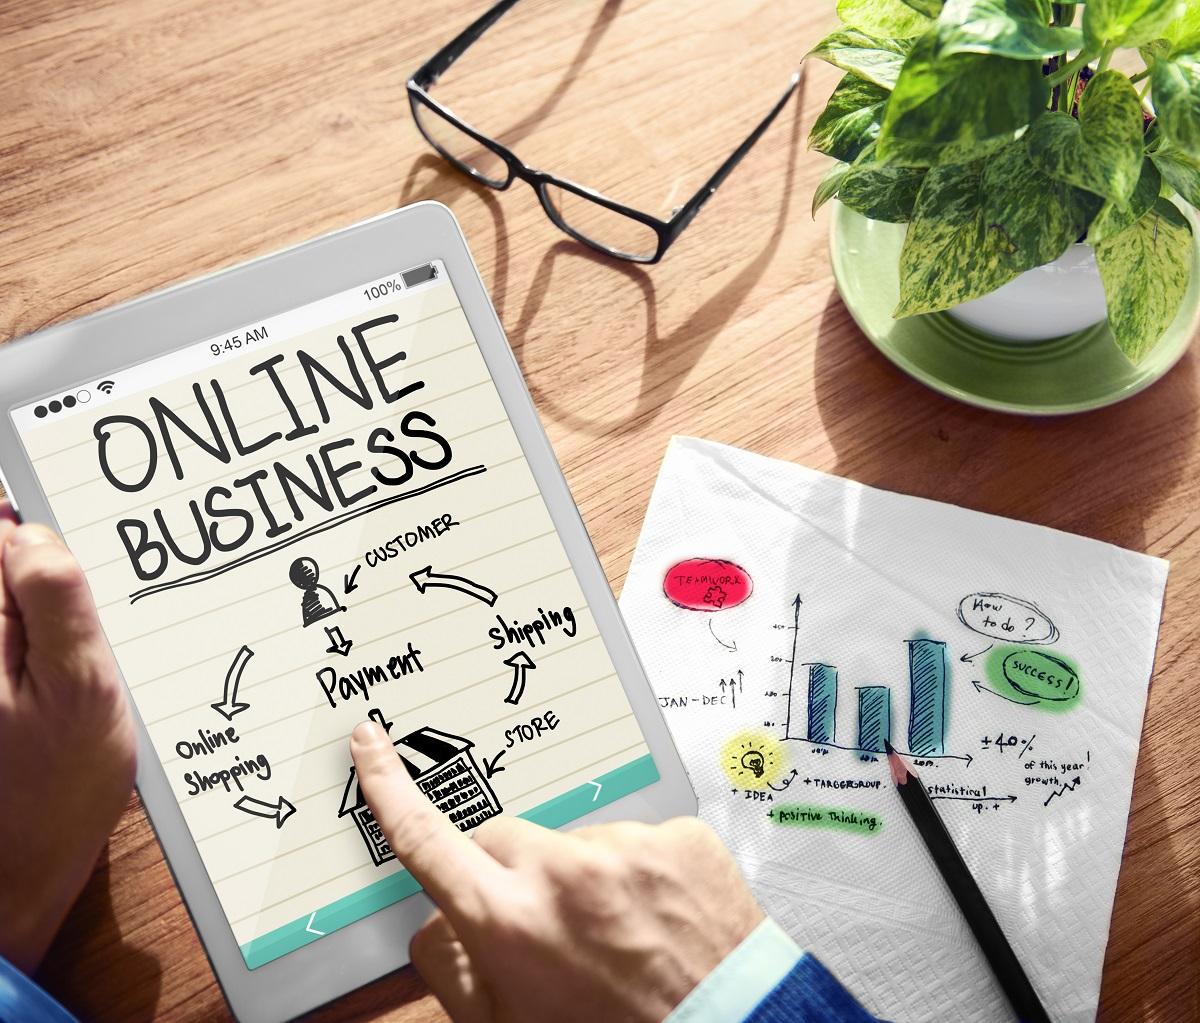 Online-Business-Ideas